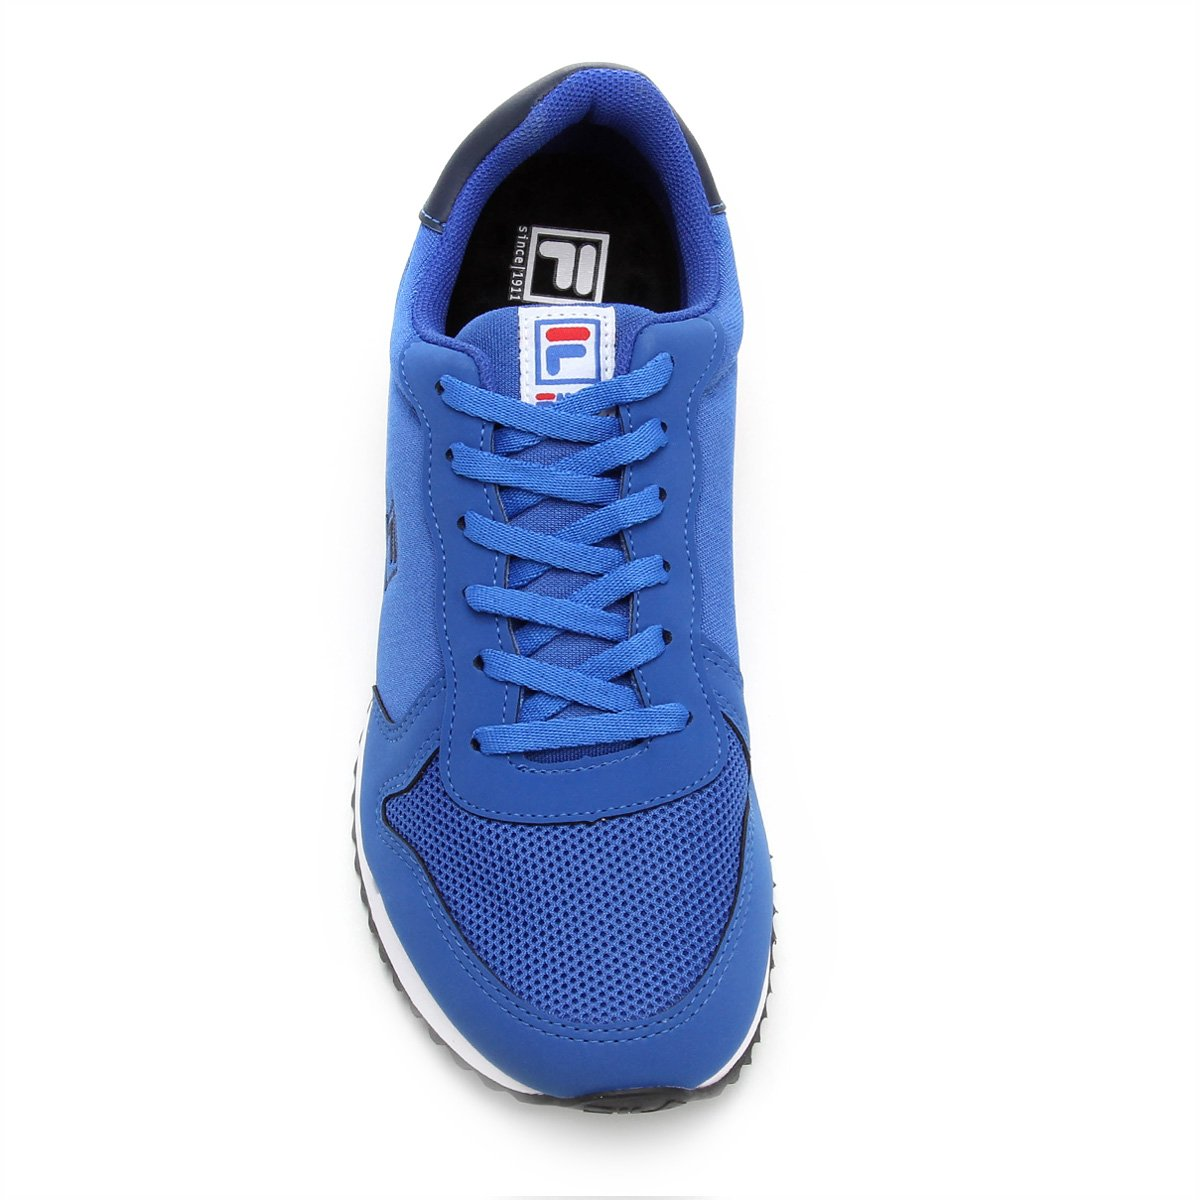 Runner Azul Tênis Retrô Fila e Masculino Tênis Marinho Fila AAYIW